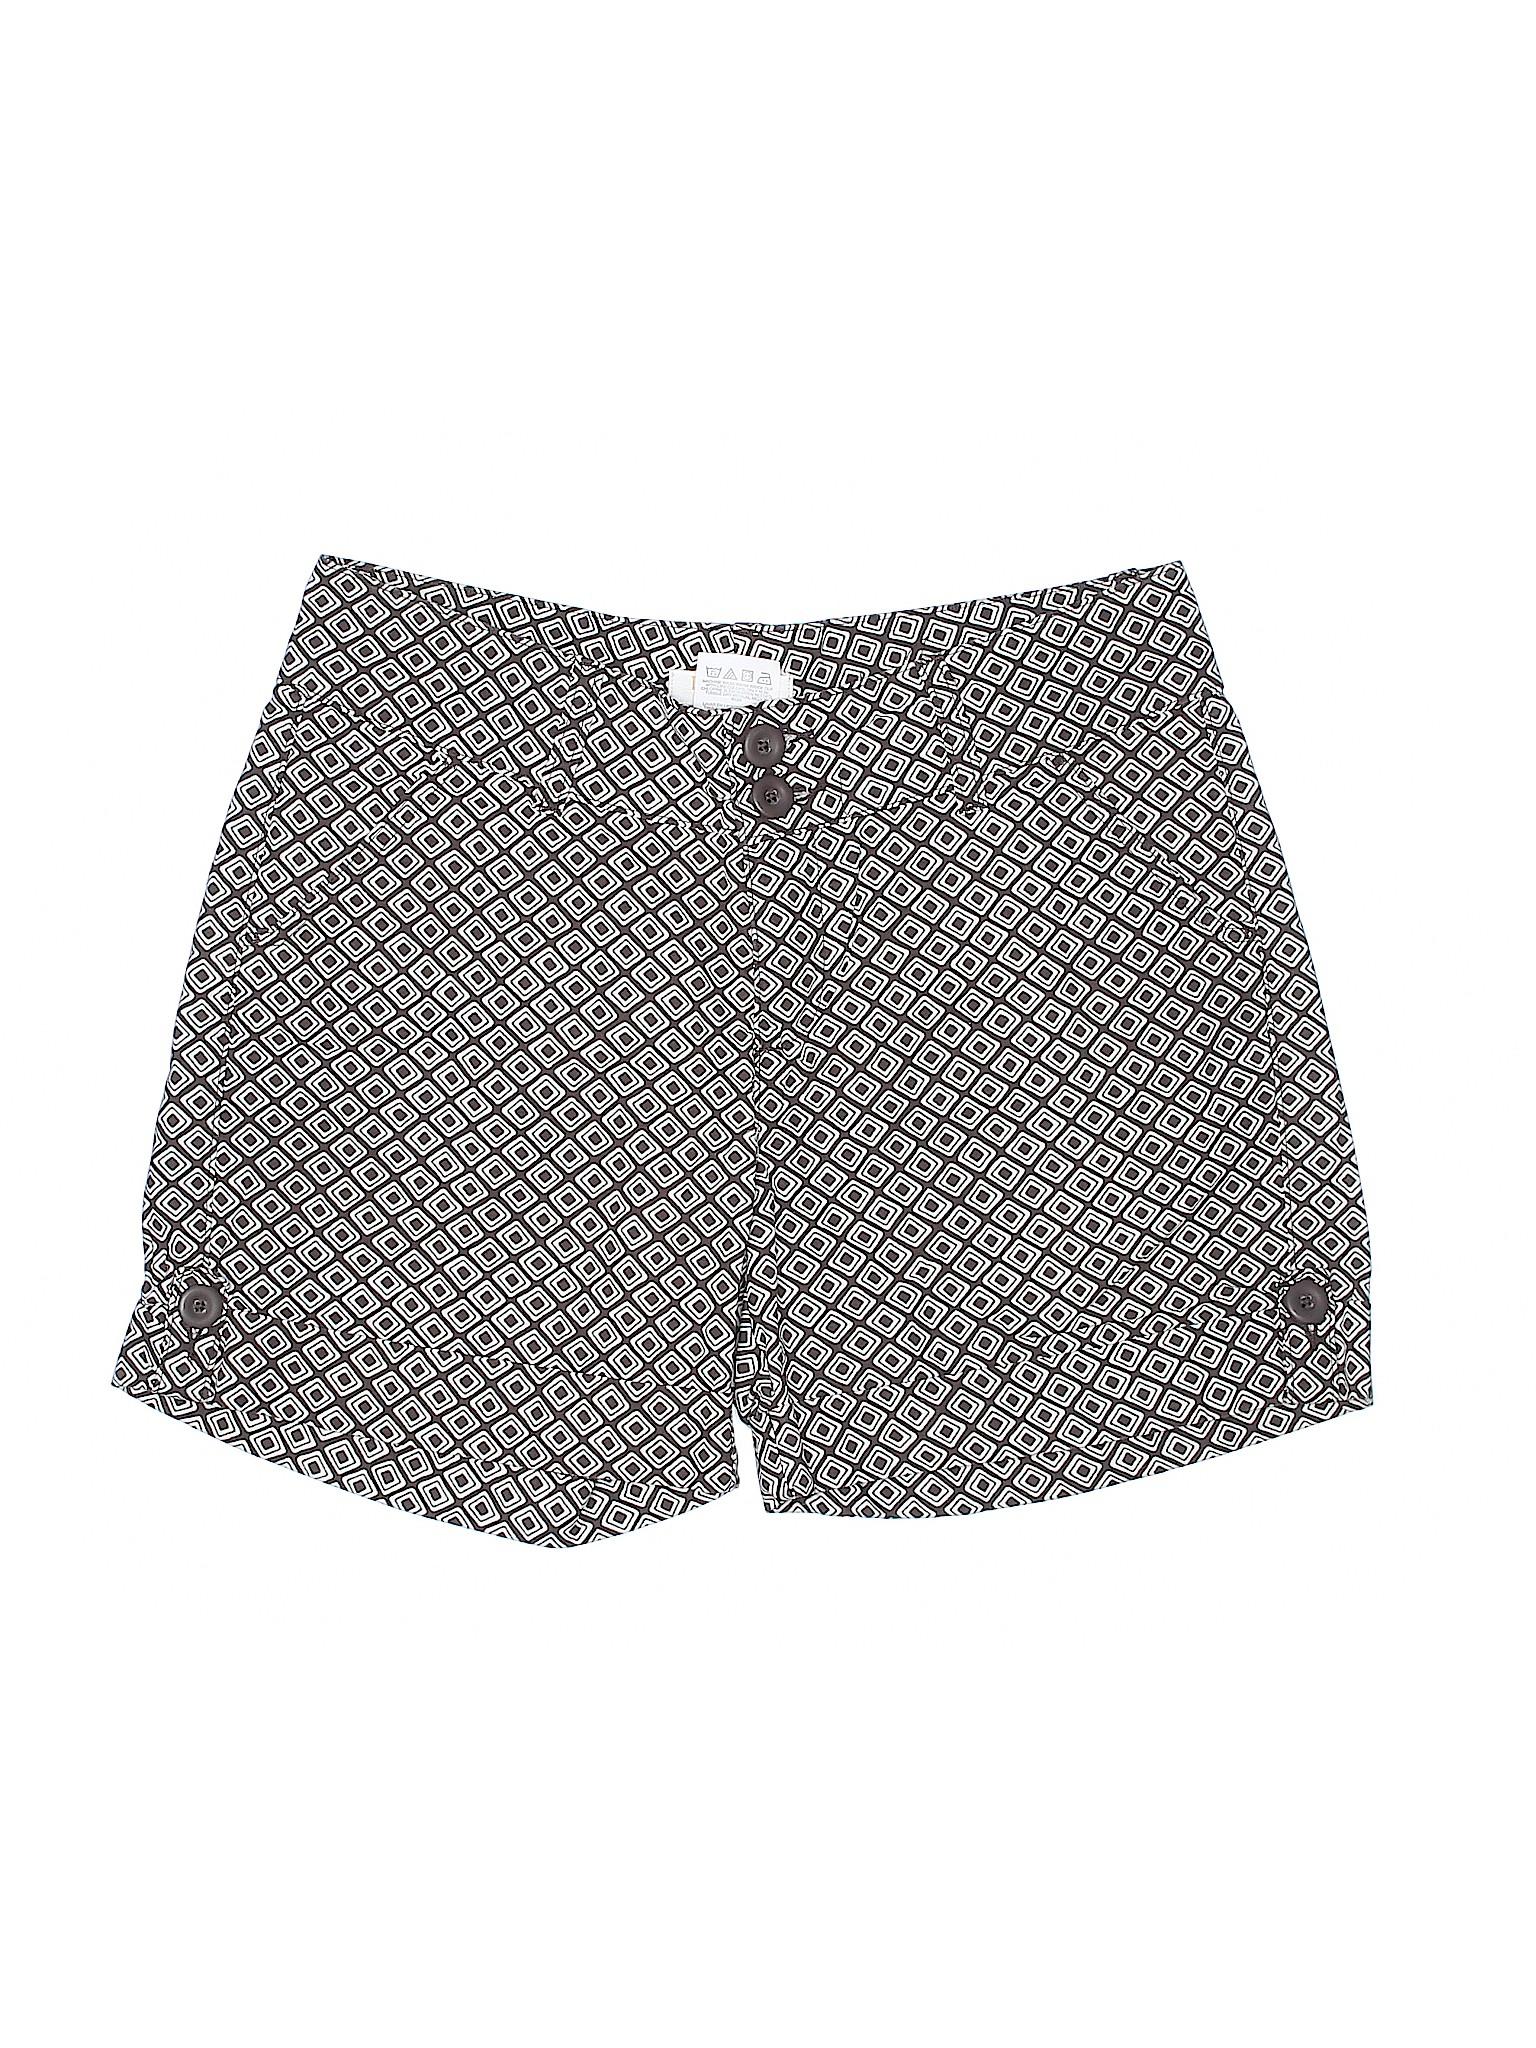 Lee Khaki Boutique Khaki Shorts Khaki Shorts Lee Shorts Boutique Boutique Lee wqPawz